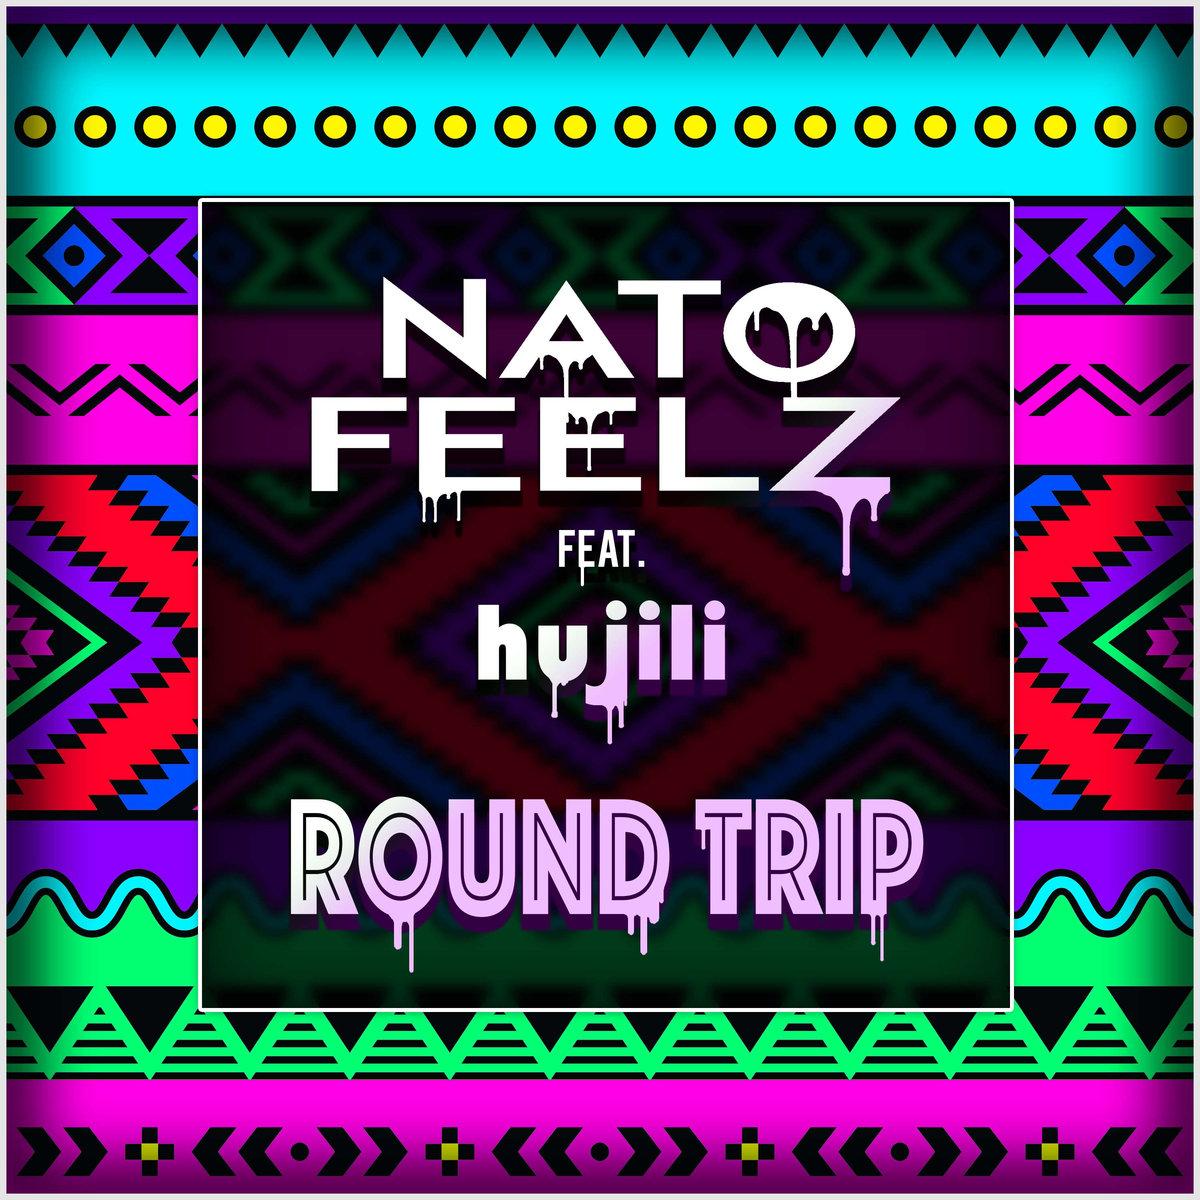 Nato Feelz feat. hujili - Round Trip @ 'Round Trip' album (electronic, dubstep)